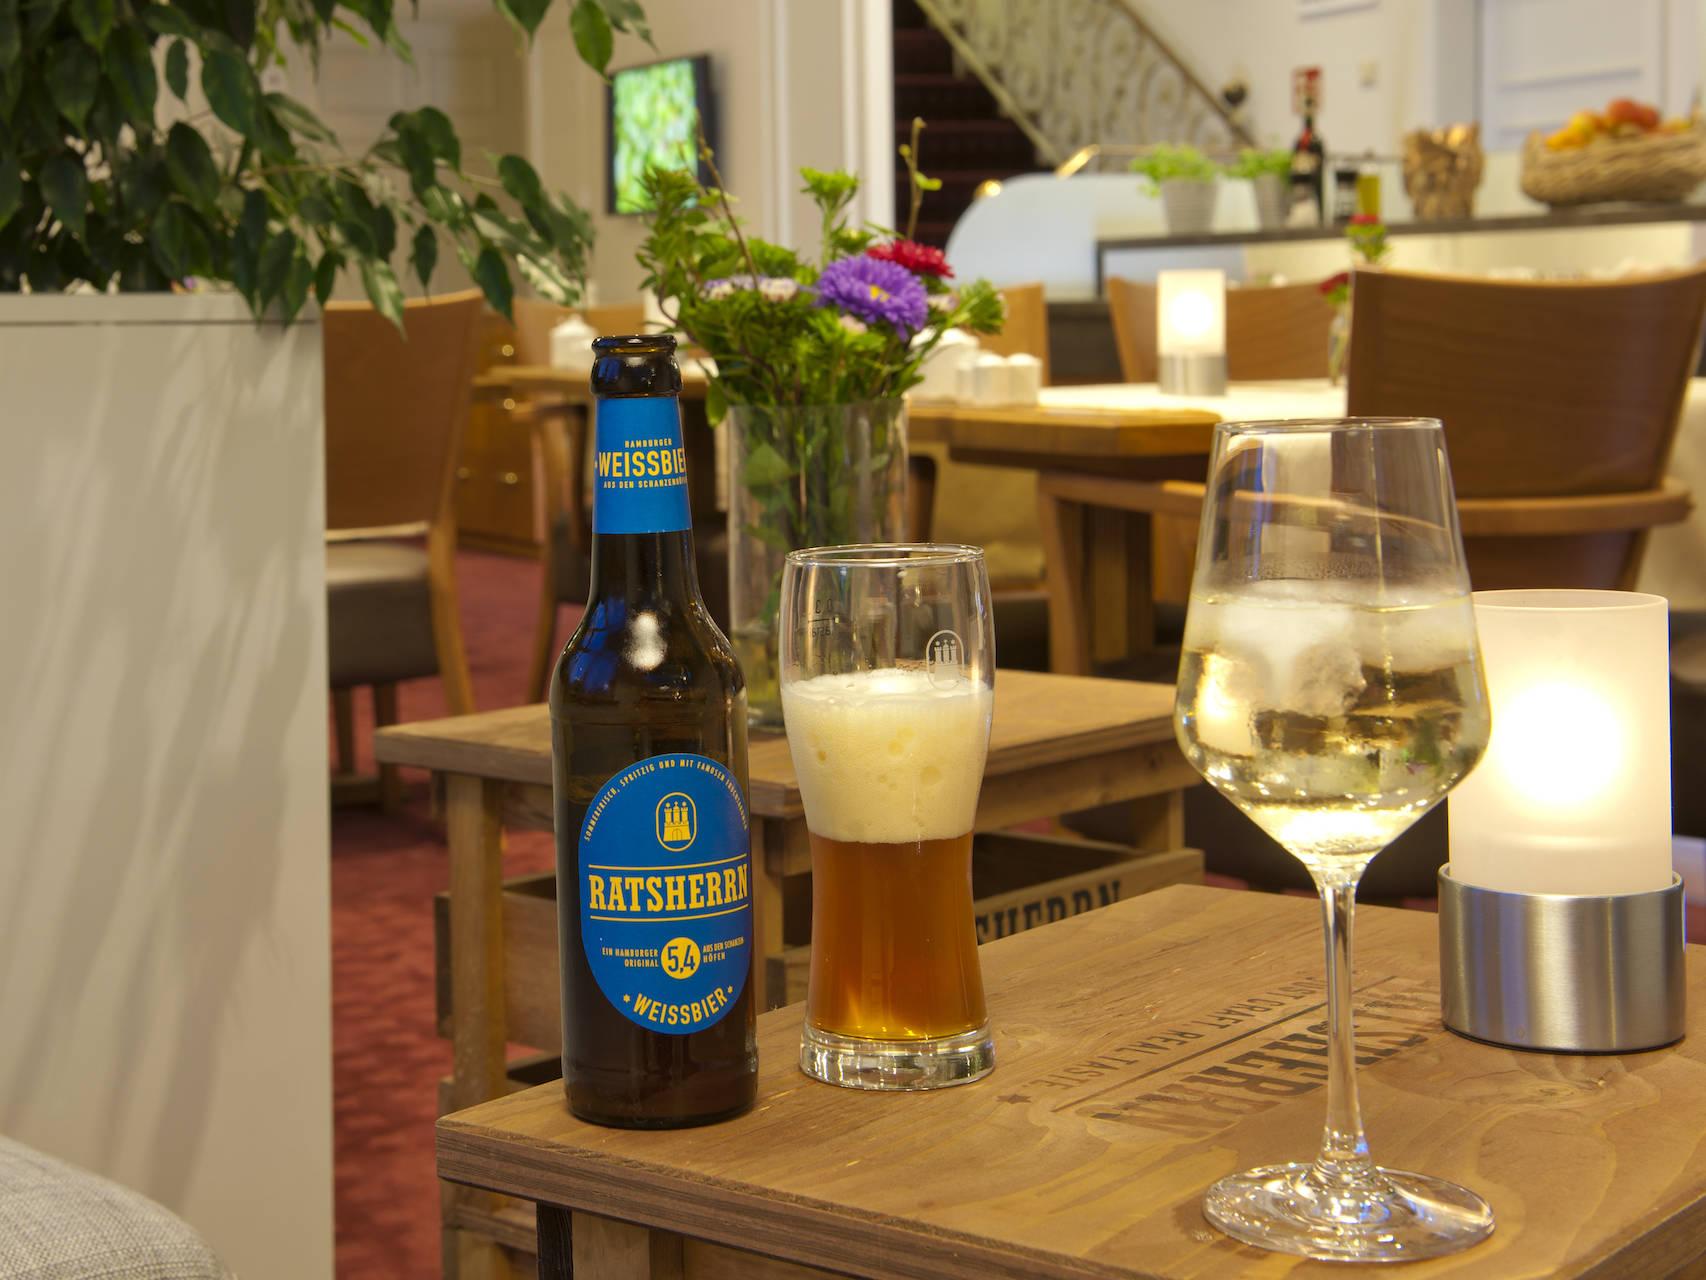 Flure Hotel am Stadtpark Buxtehude 2 uai